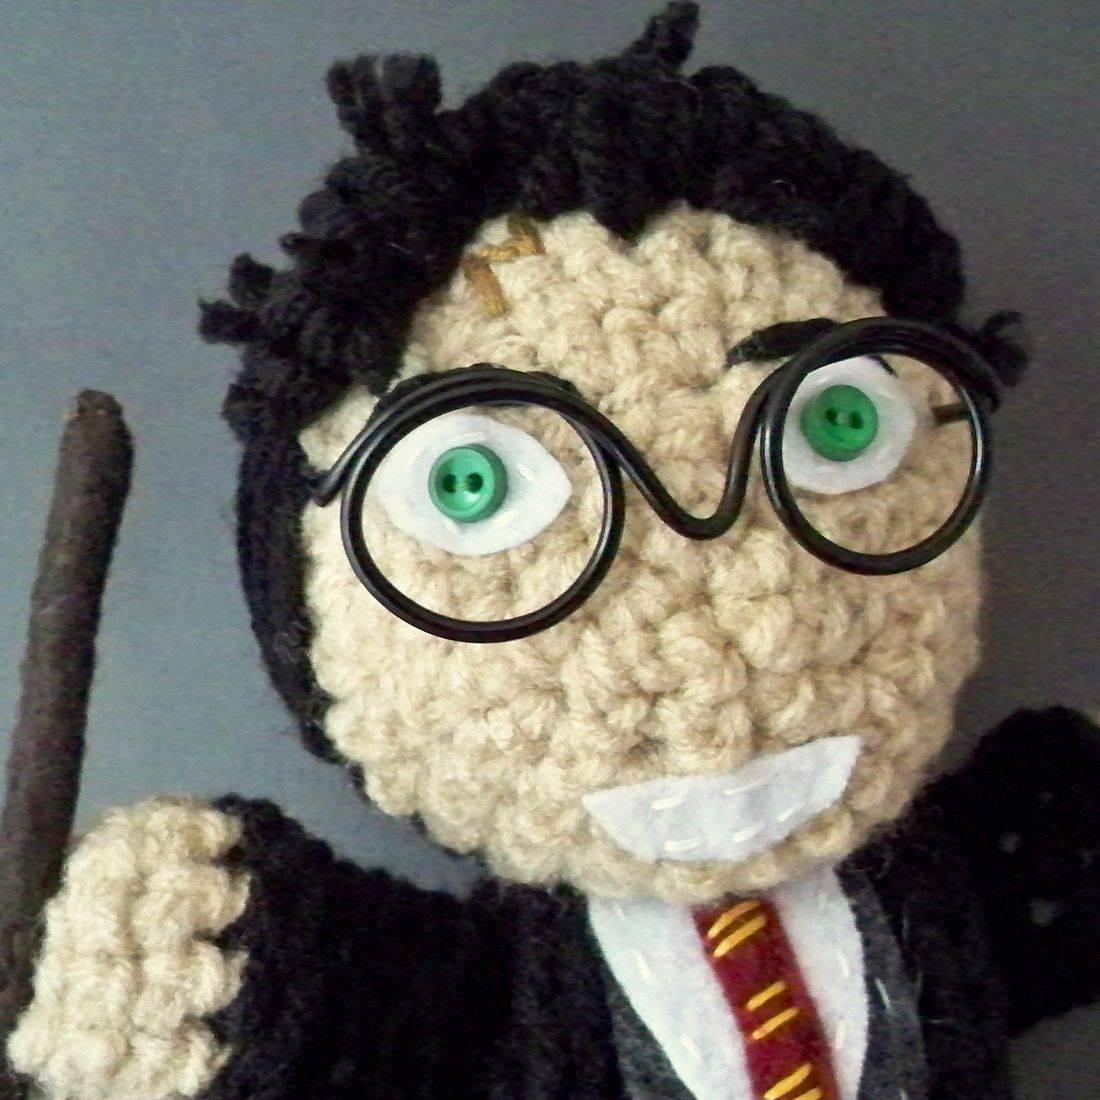 Harry Potter, Wizard, amigurumi, plush, doll, nerd, handmade, geek